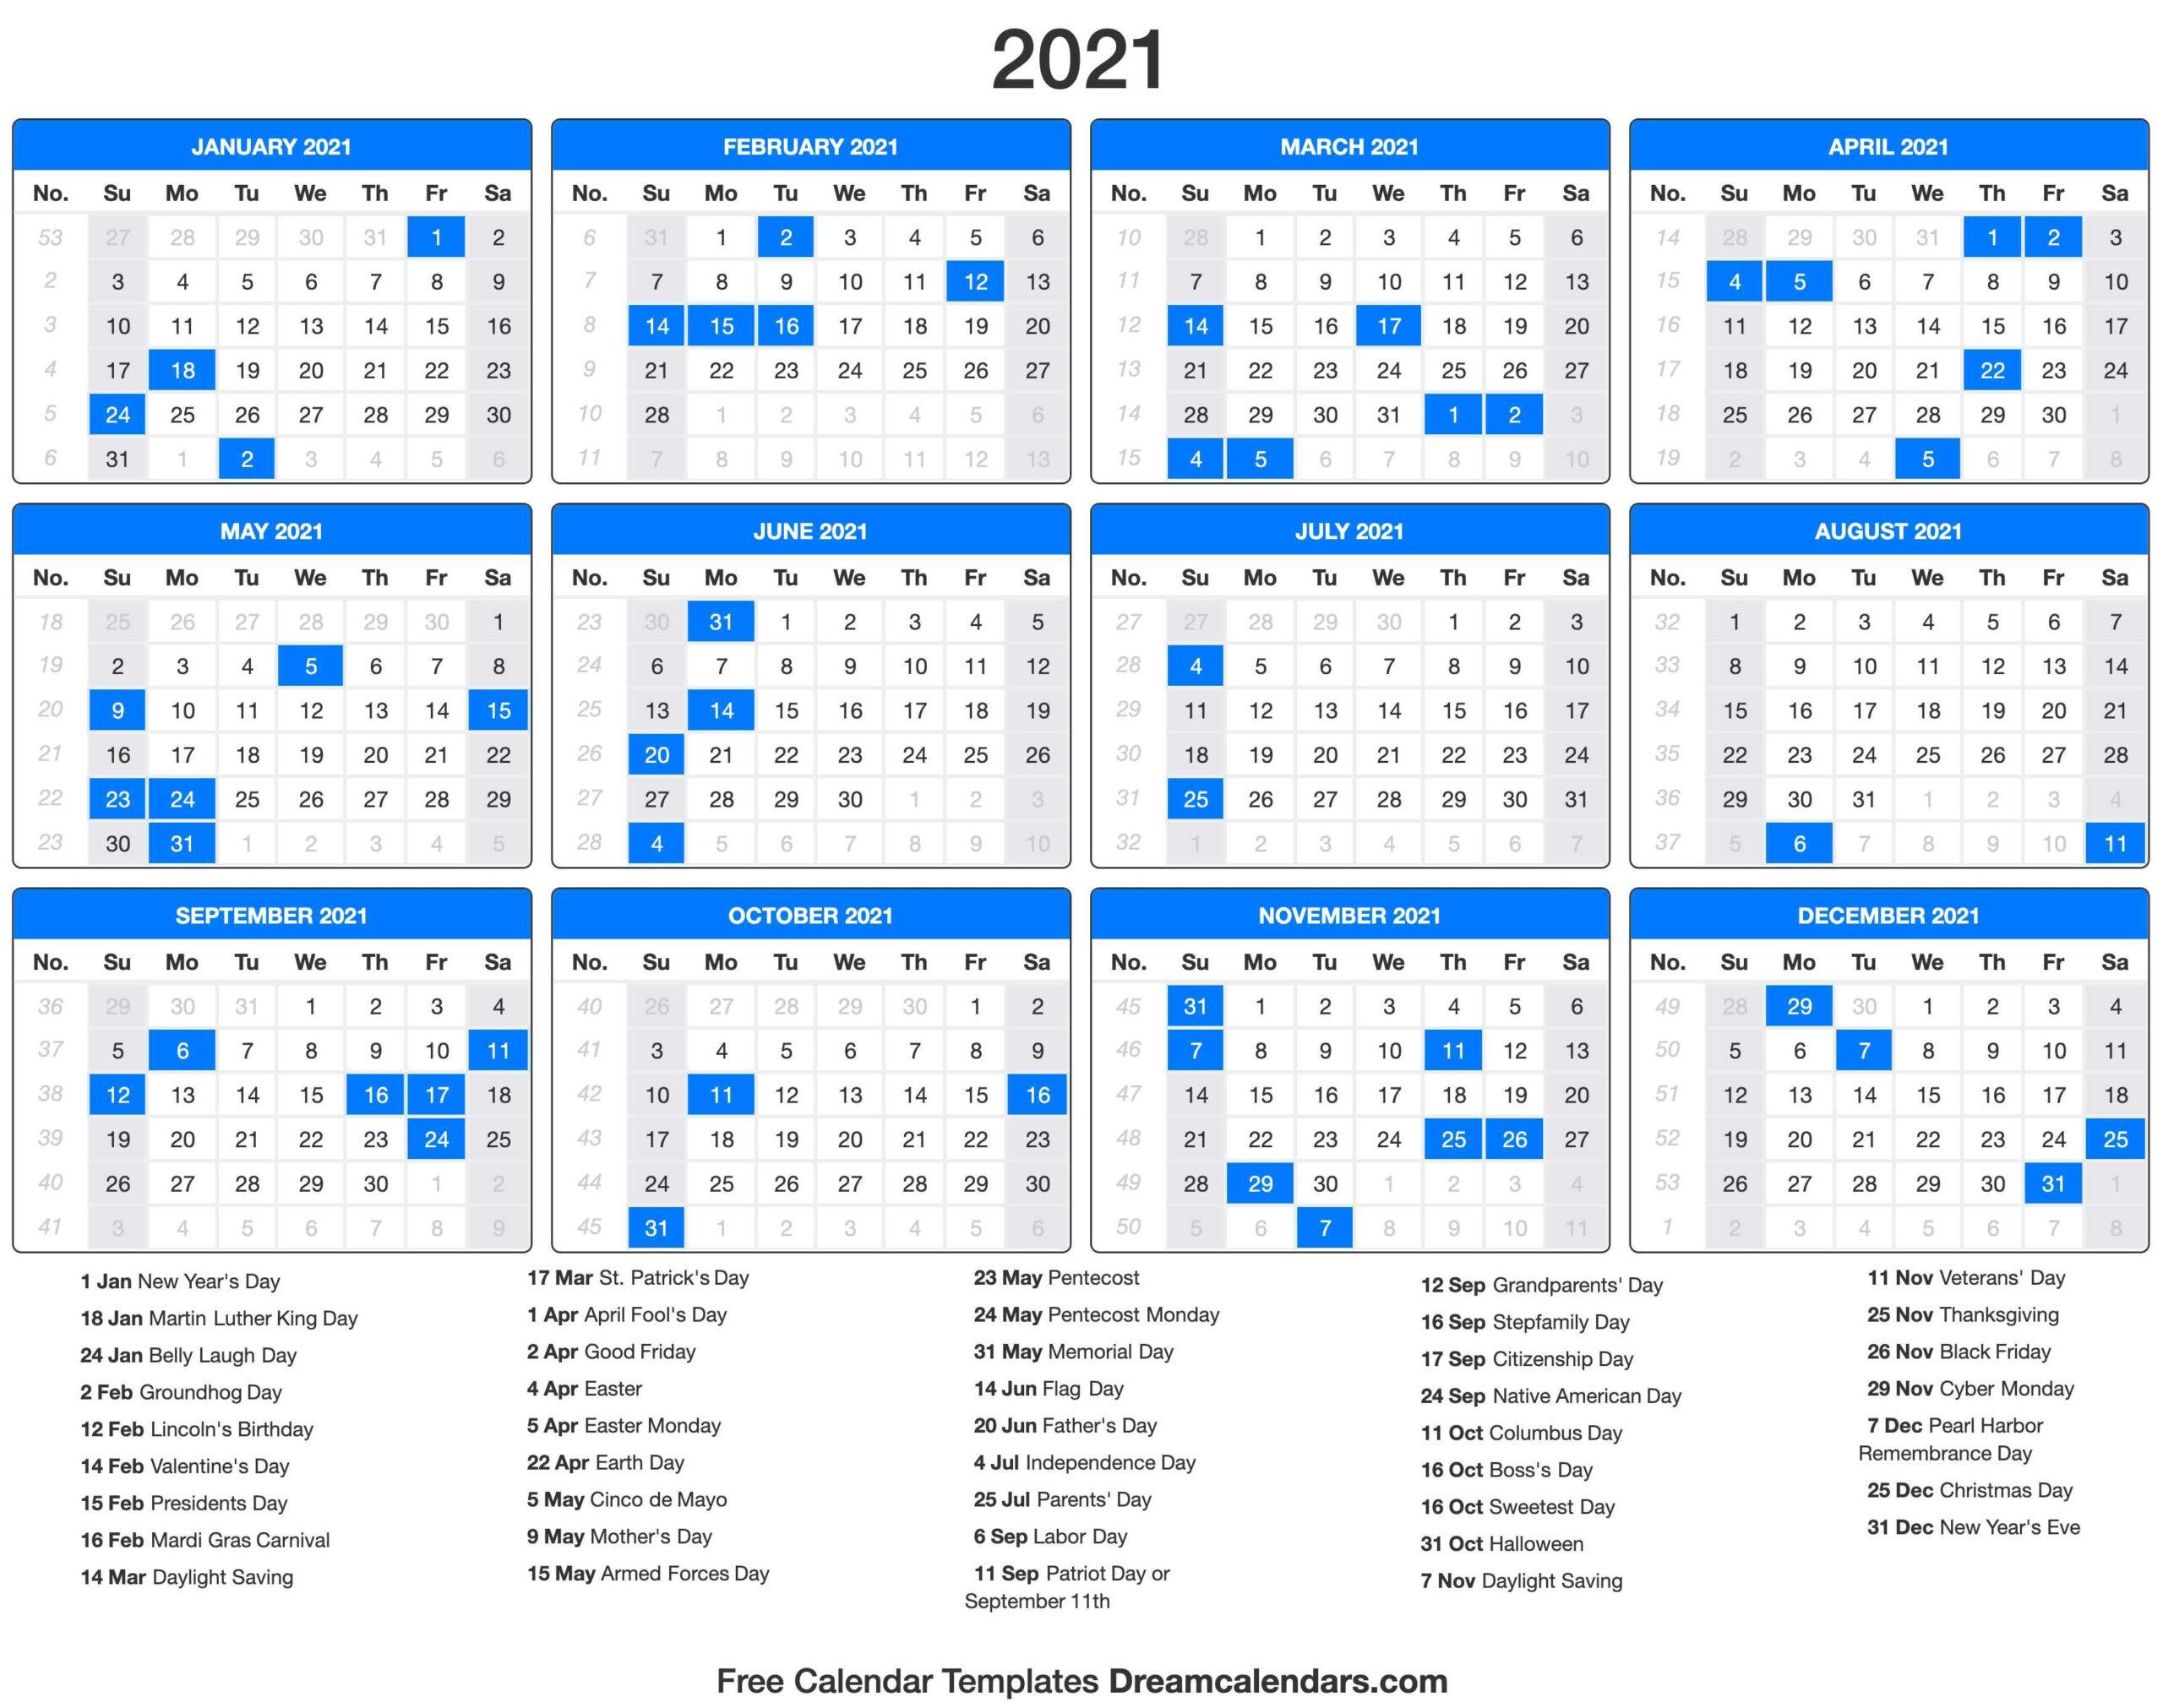 2021 Calendar Printable Pdf With Holidays | 2021 Printable_Bulk Calendar Printing Us